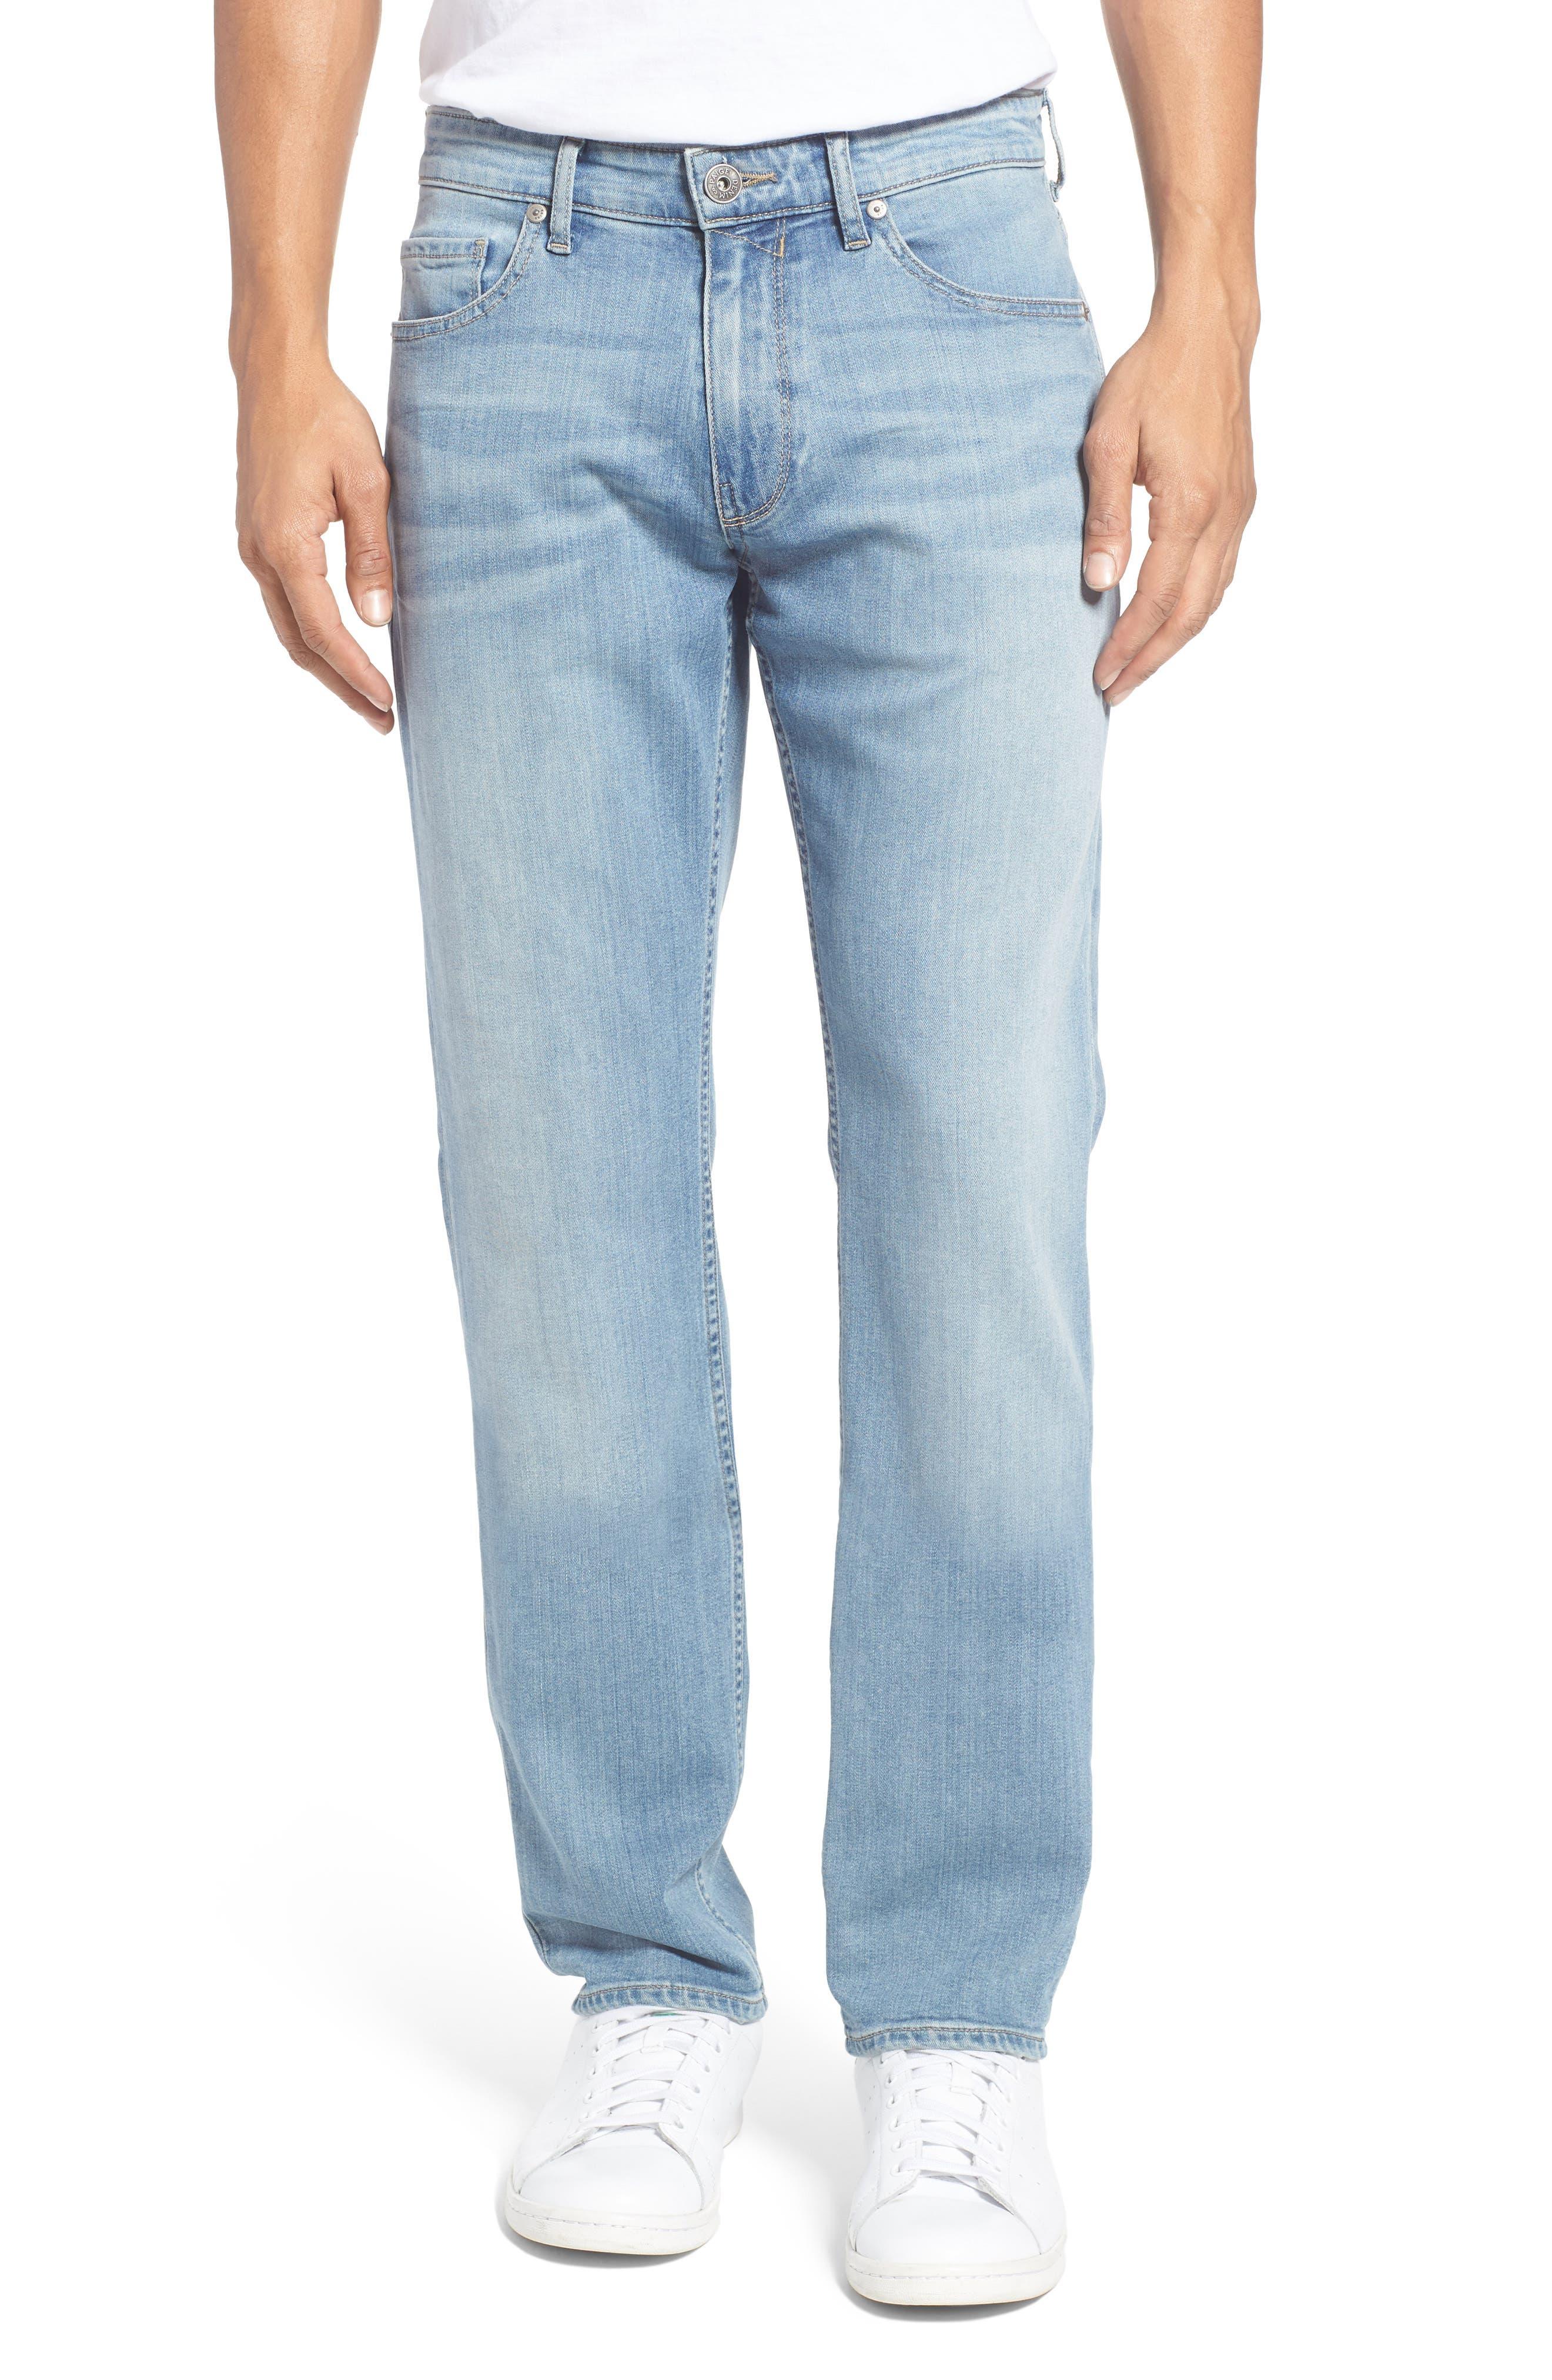 Image of PAIGE Federal TRANSCEND Slim Straight Leg Jeans